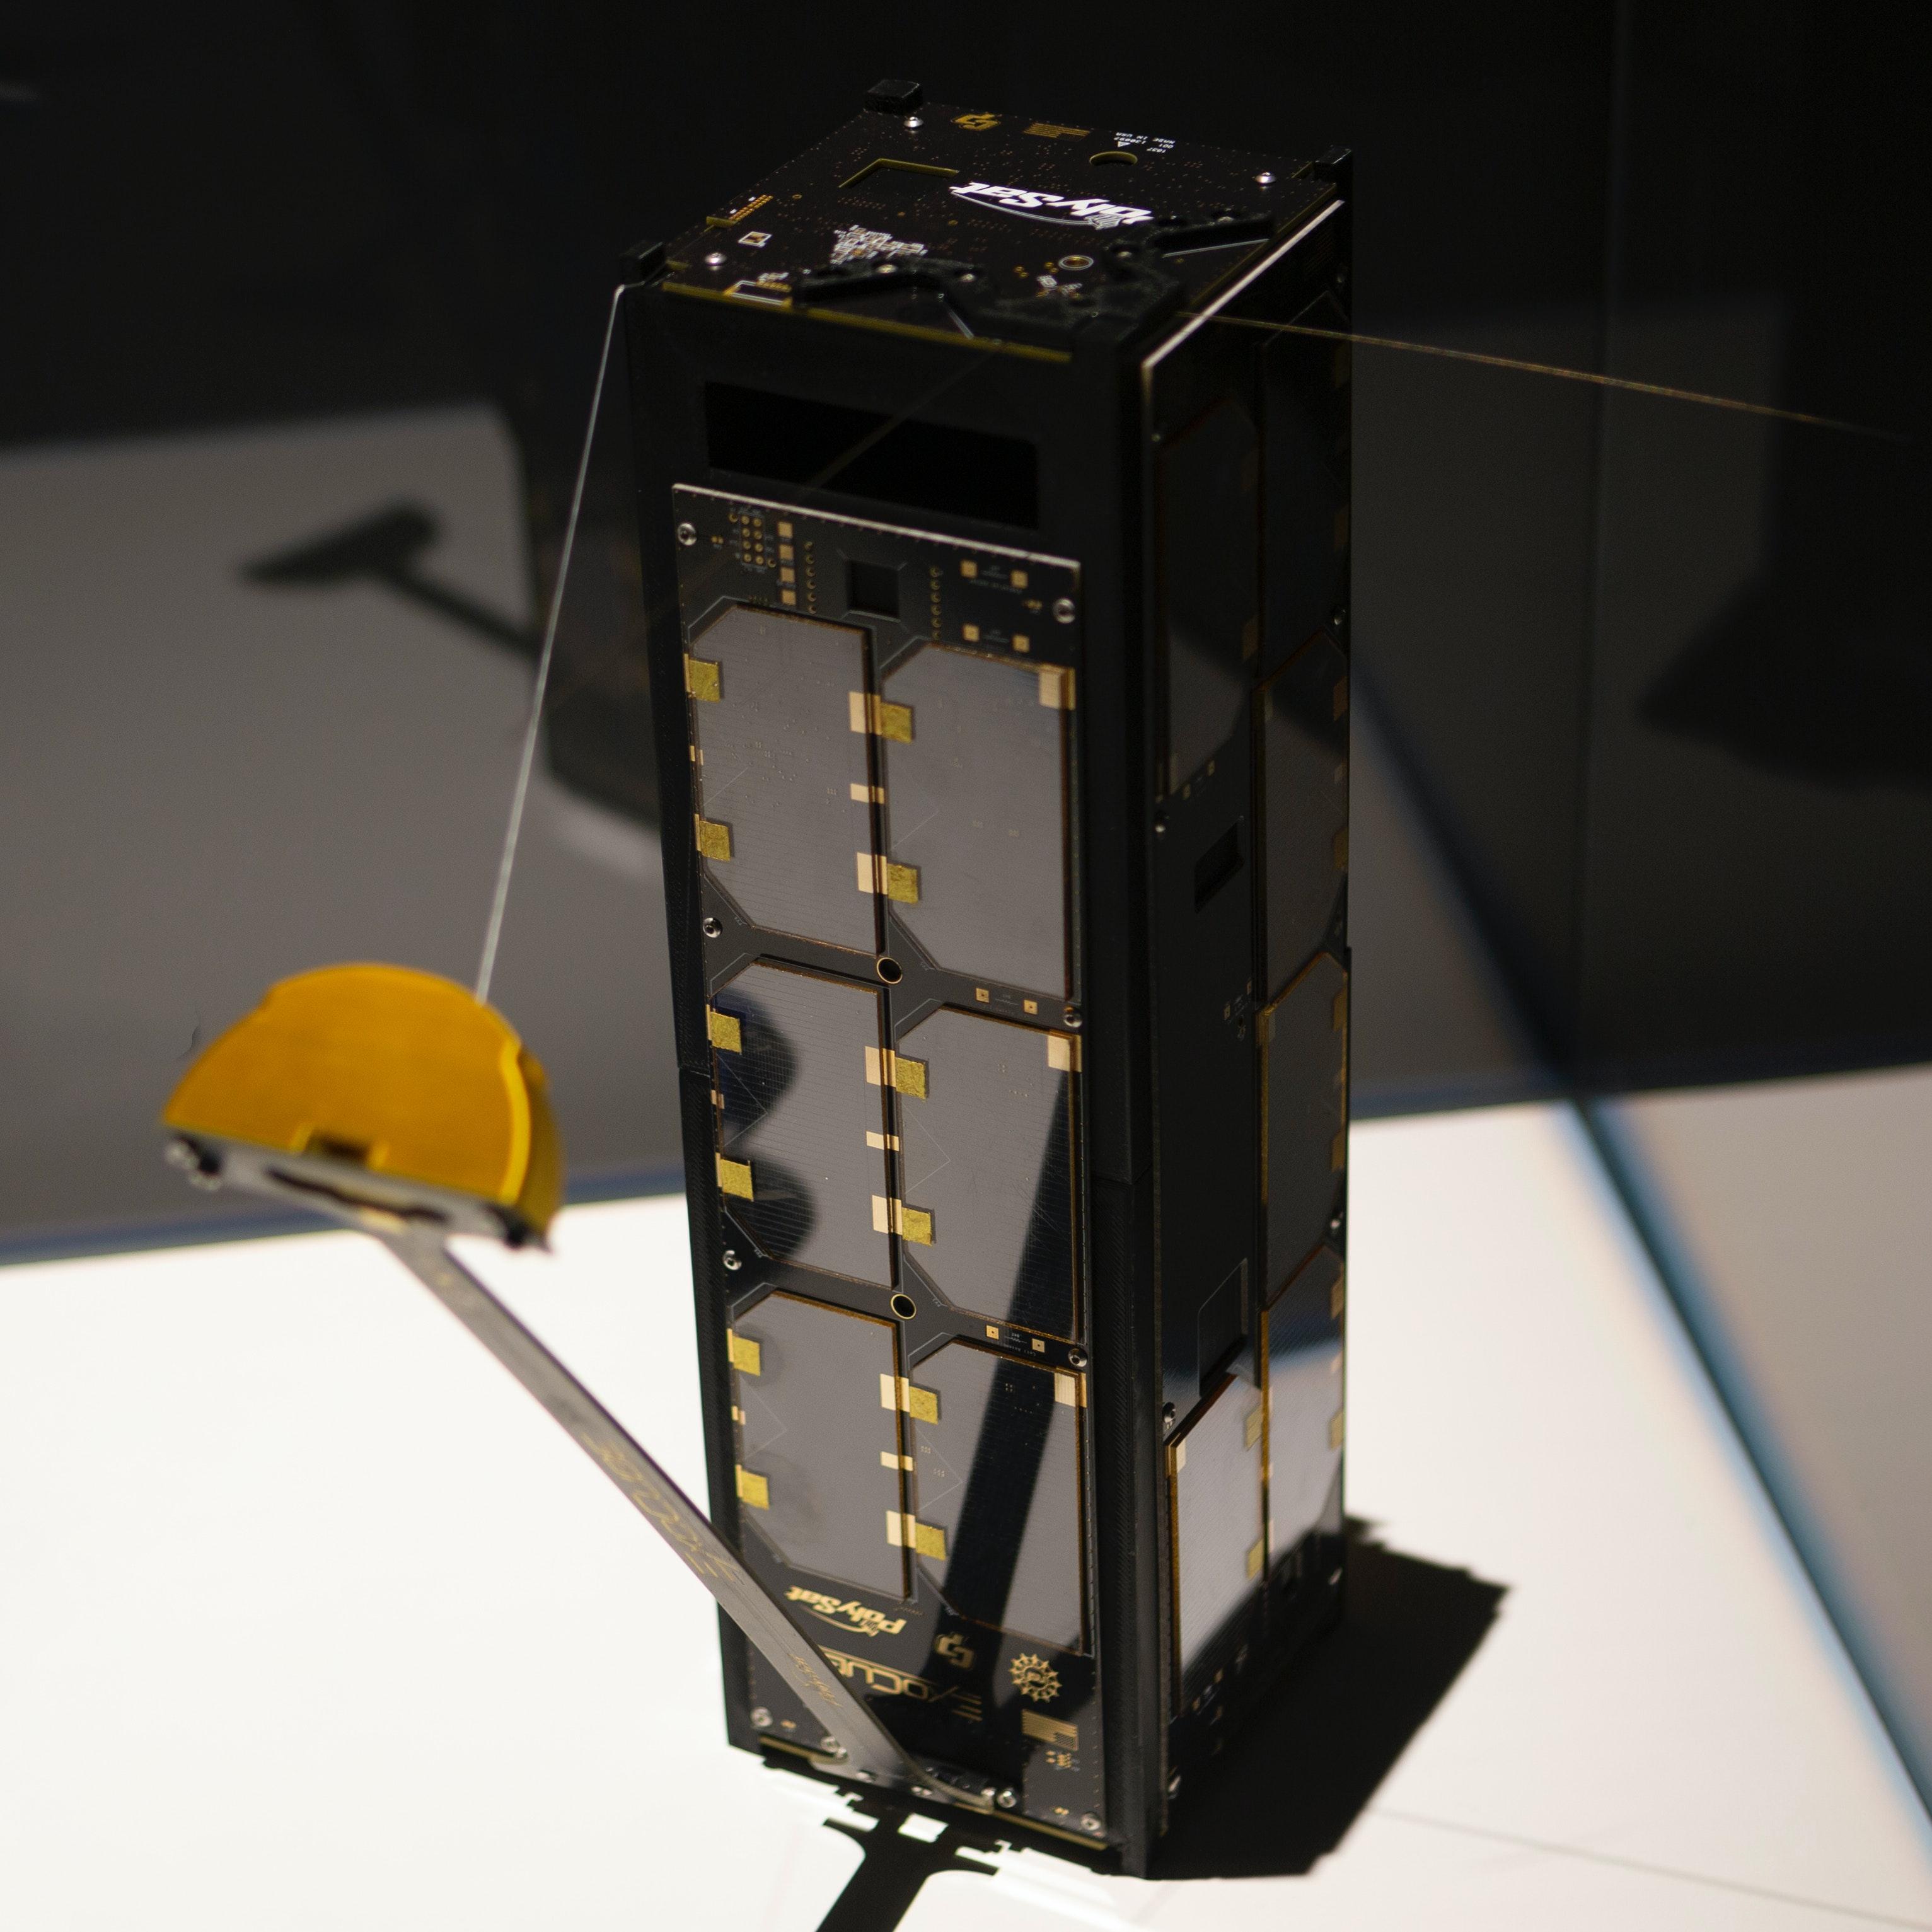 Image of rectangular satellite on display in vitrine